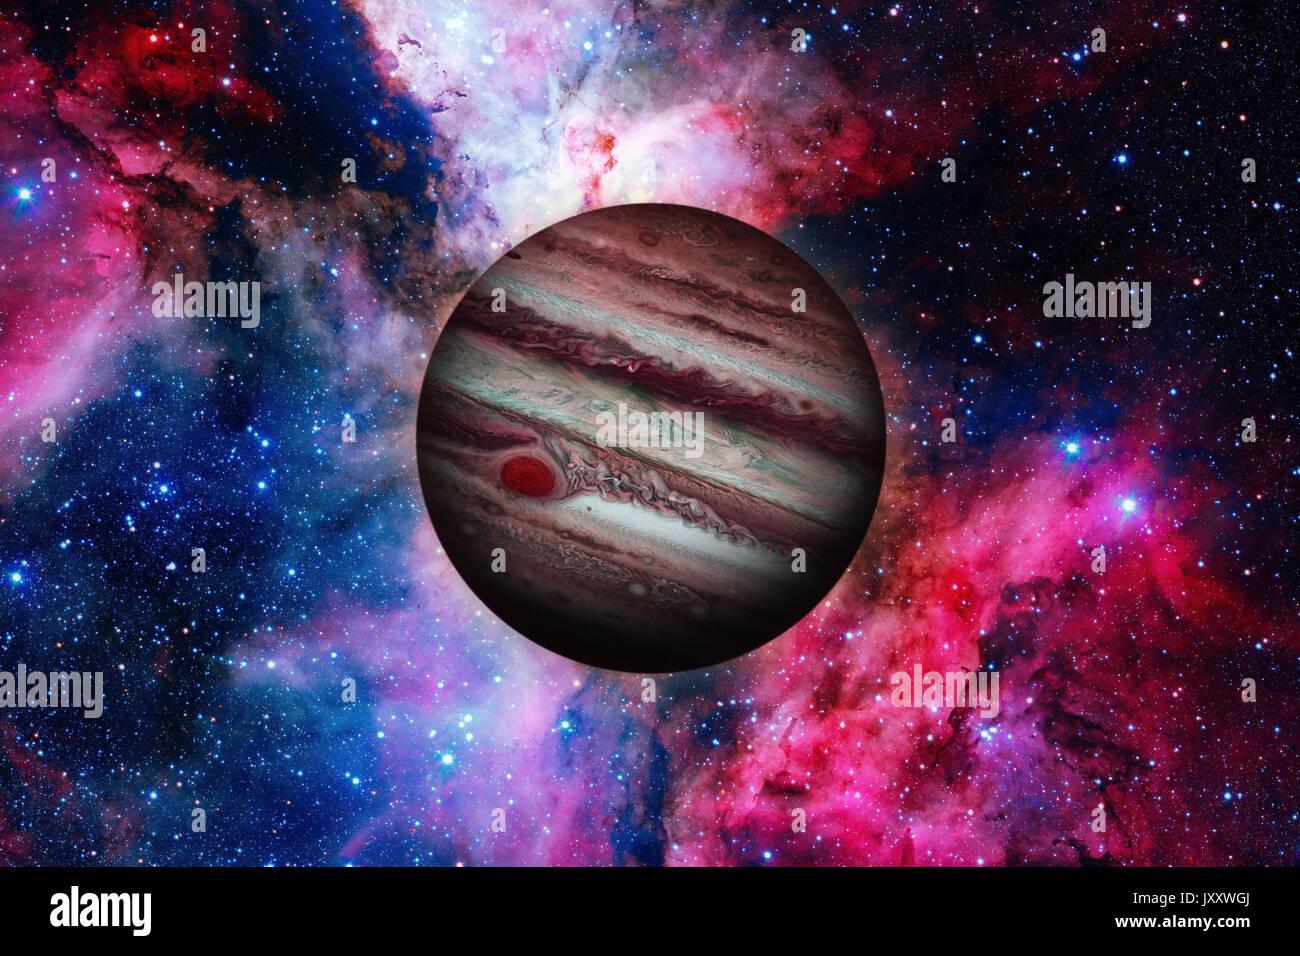 solar system jupiter planet - photo #22